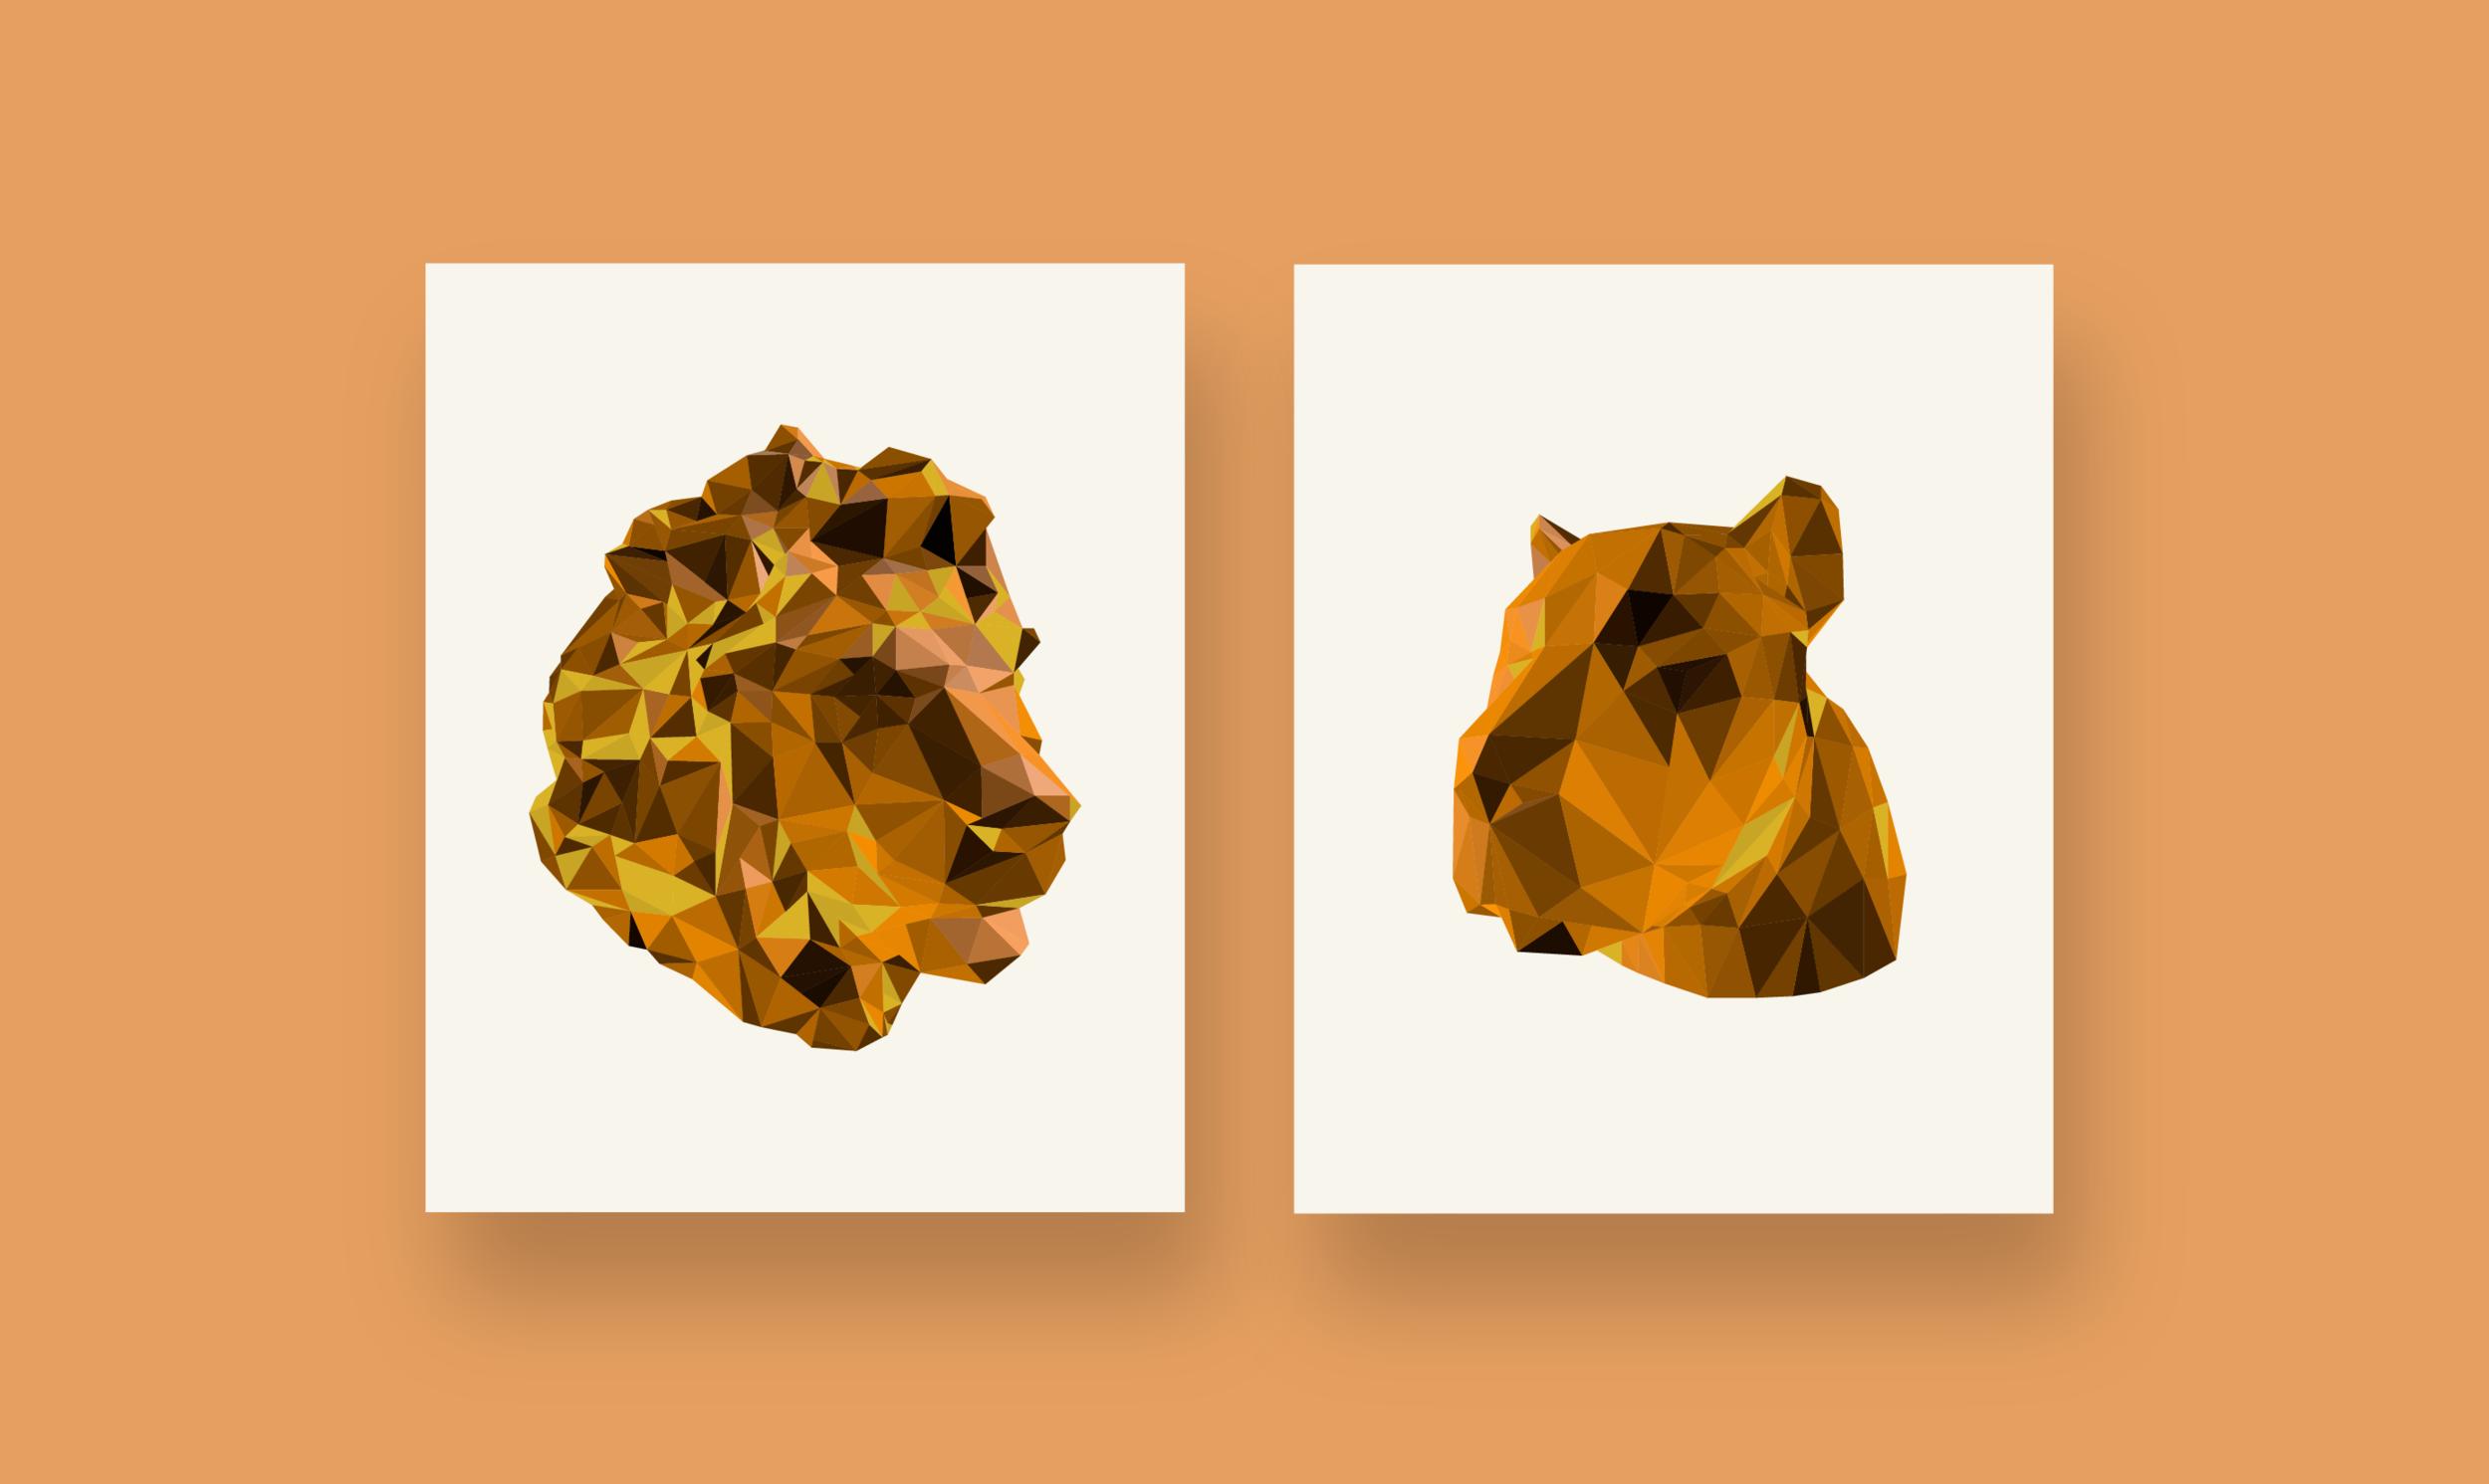 3D Illustration - Digital Print on Canvas